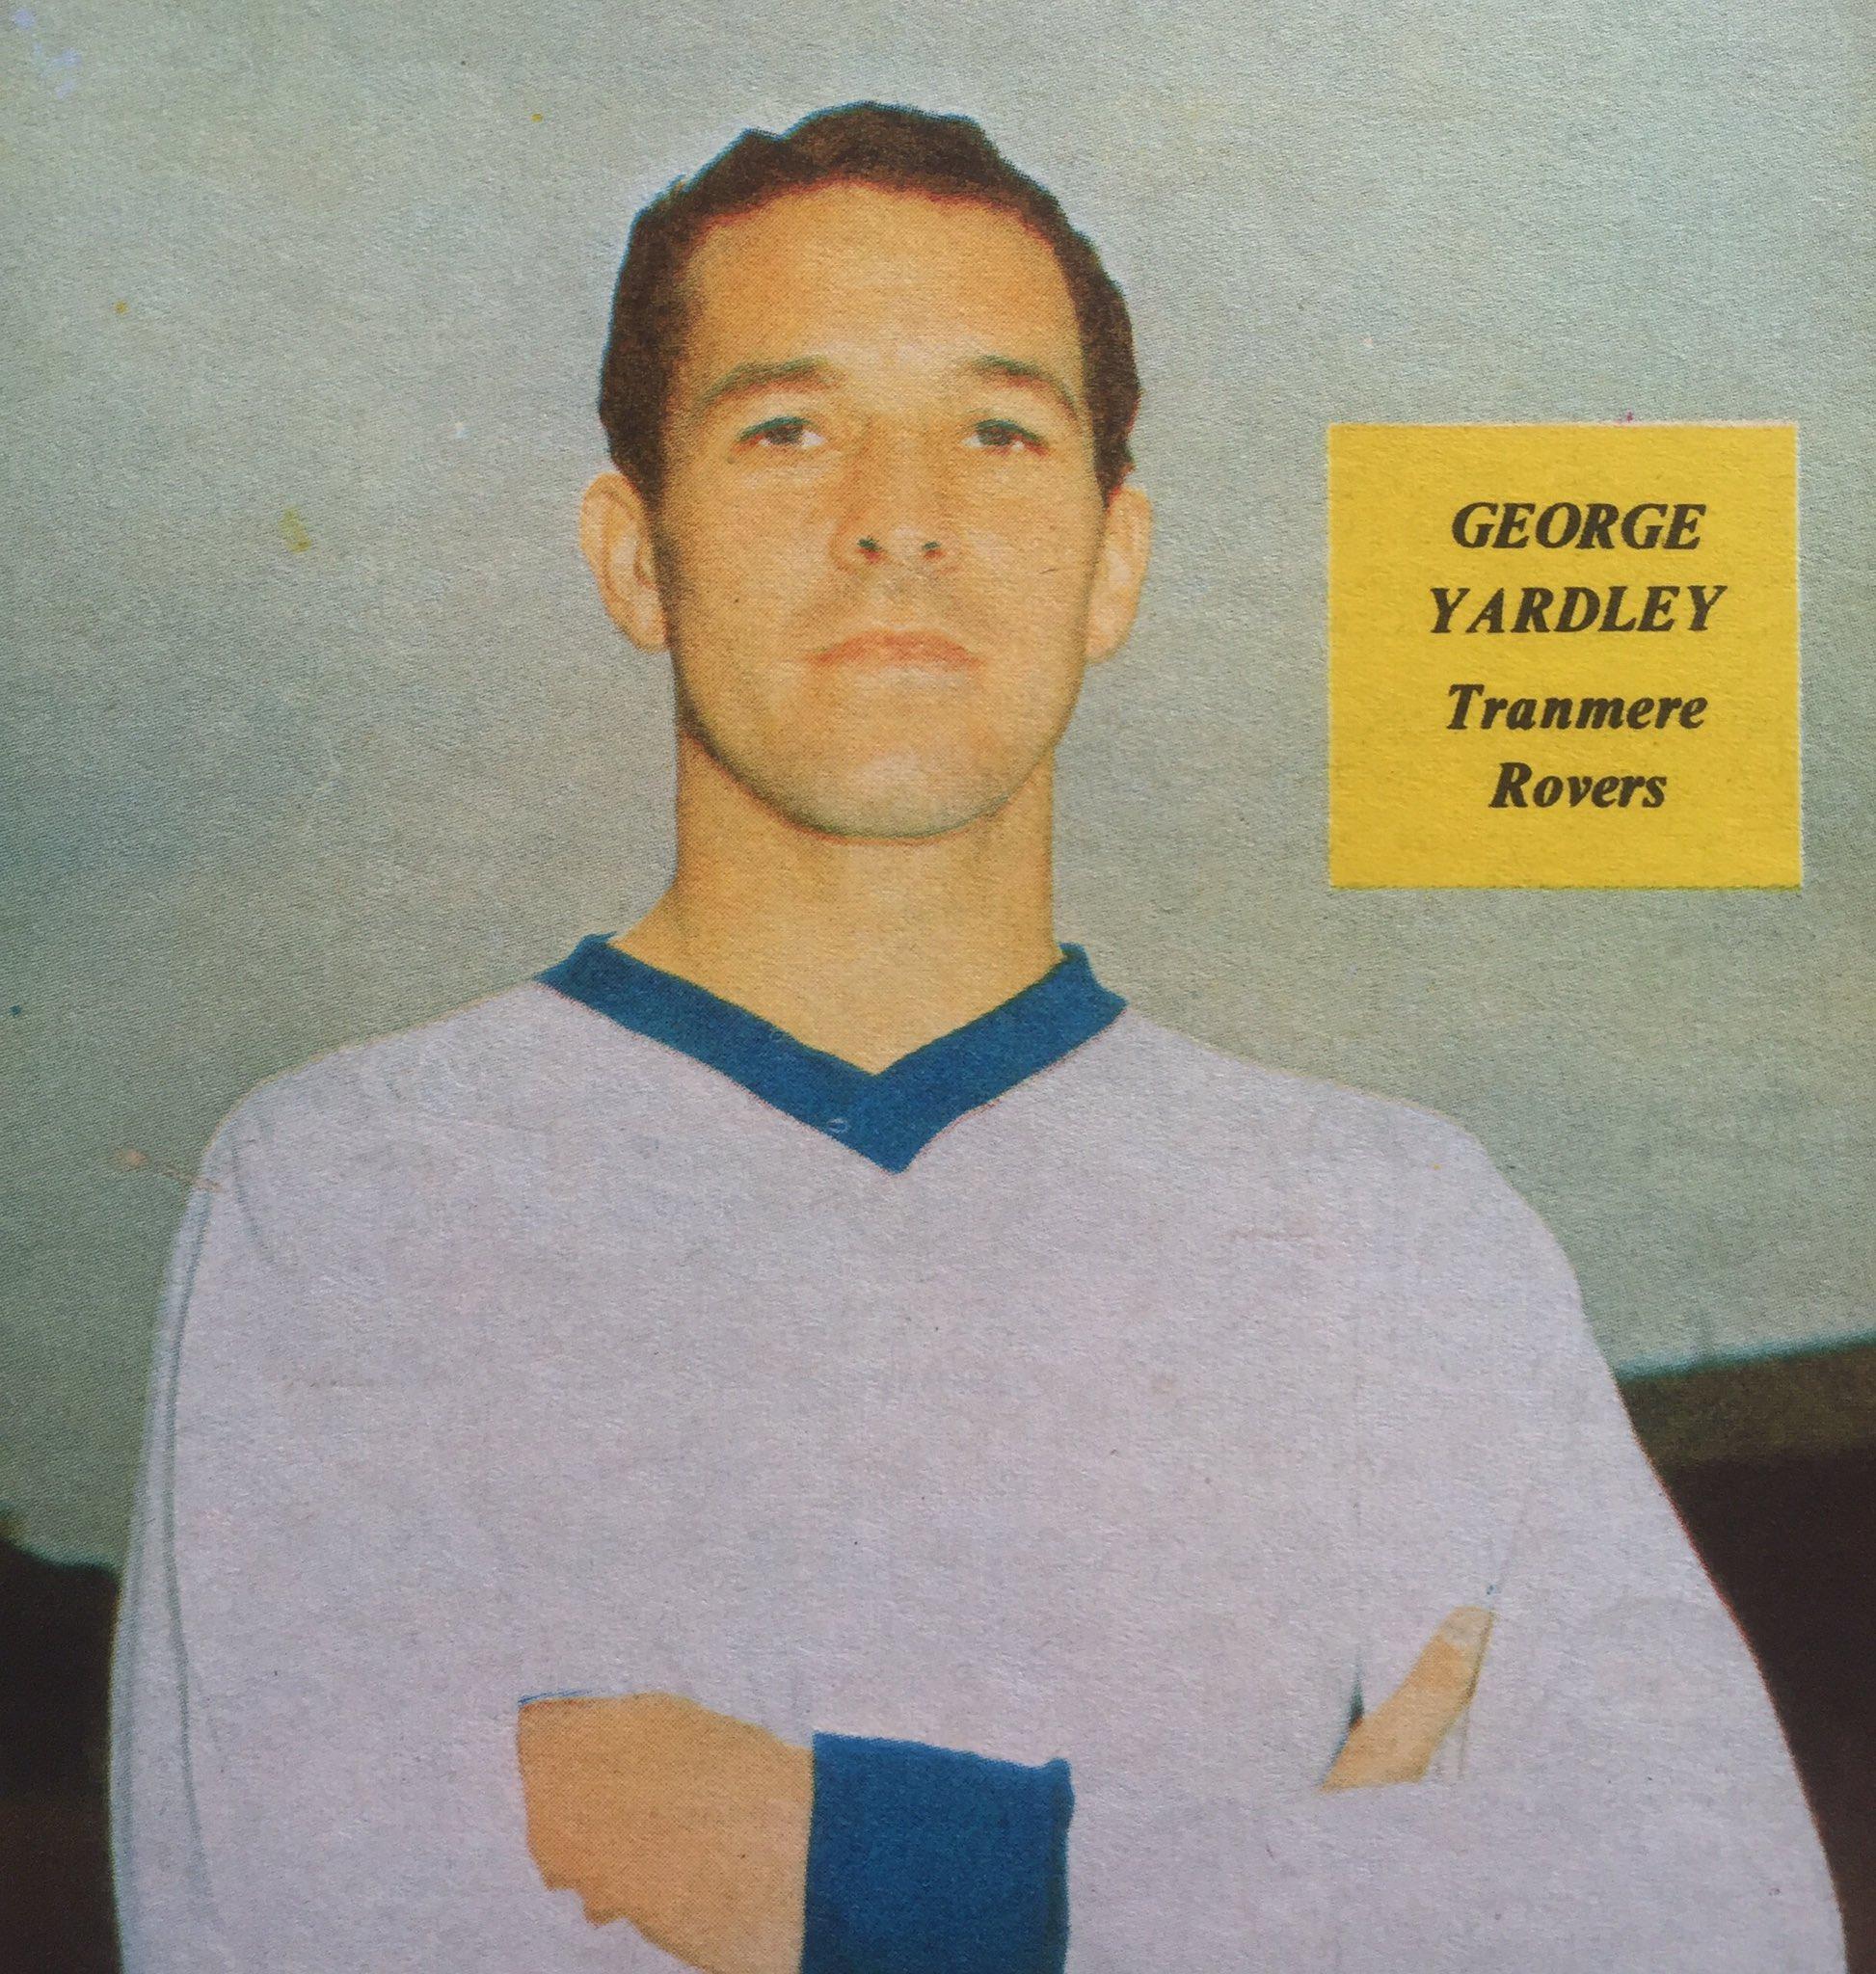 "Football Memorabilia on Twitter ""George Yardley TRFC Keeper"